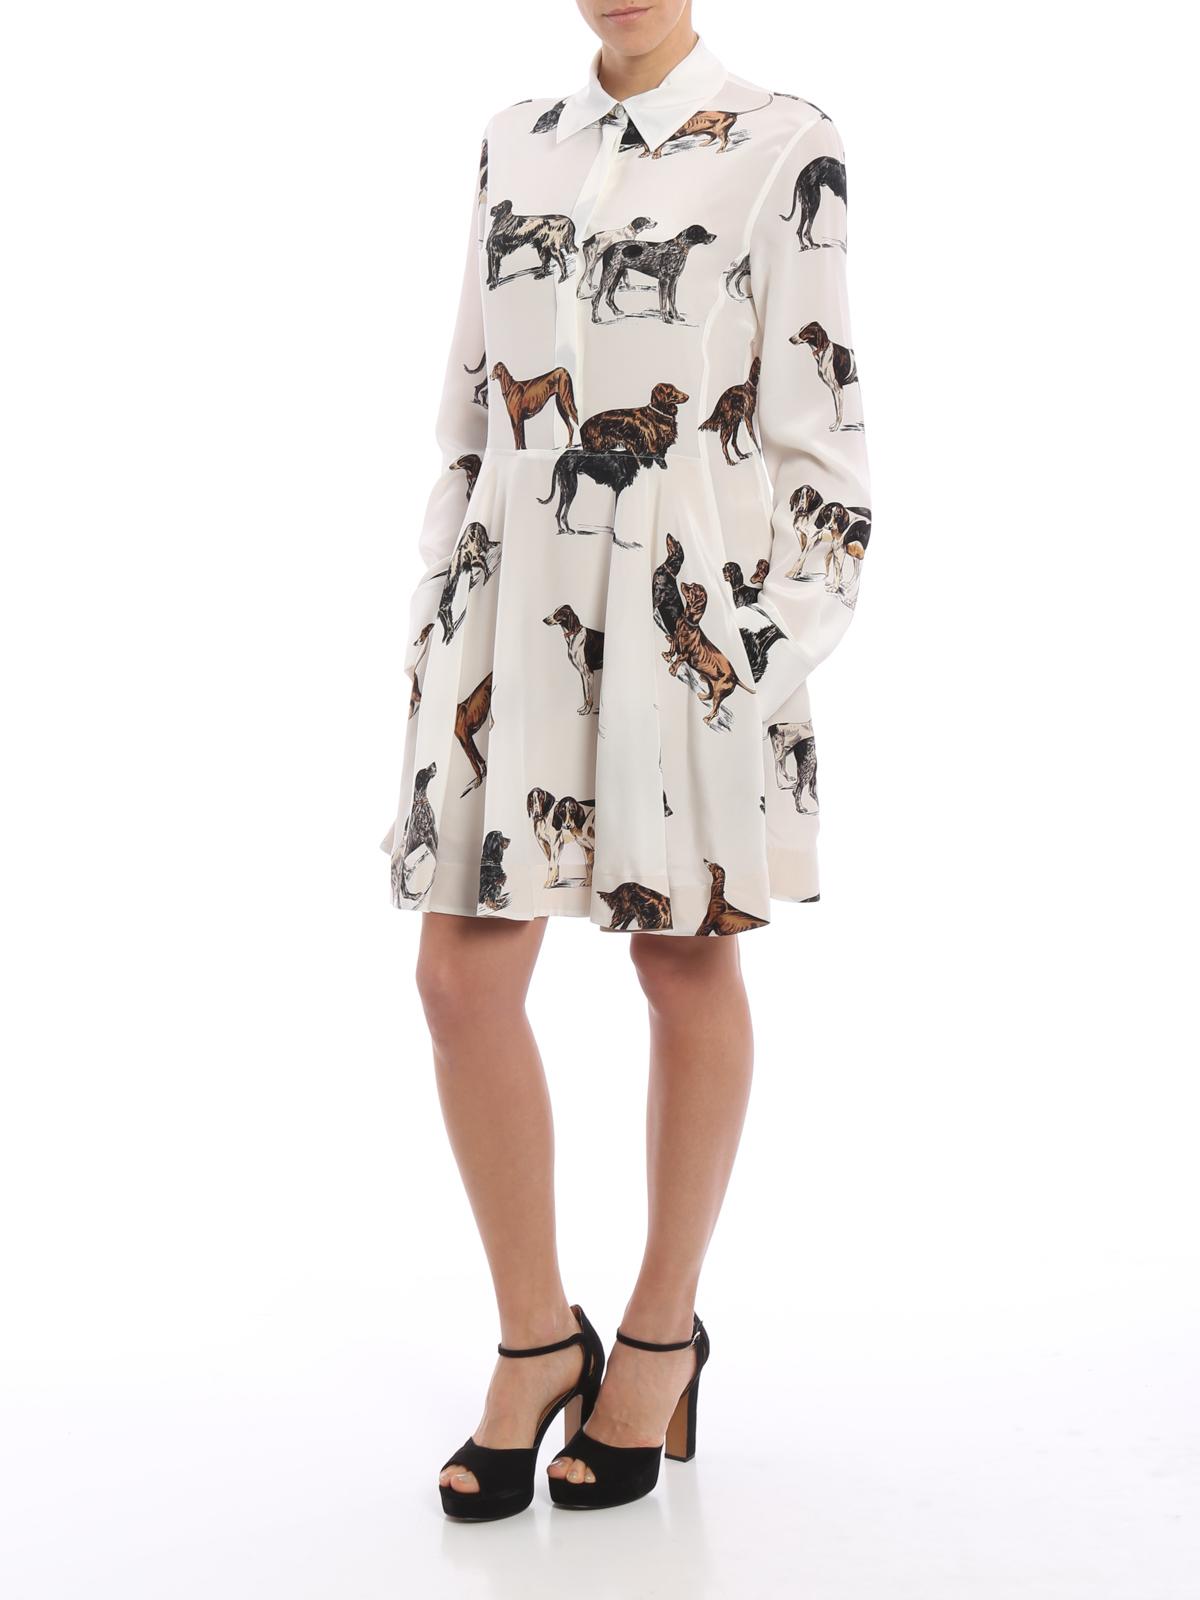 Dog Dress Online Shopping